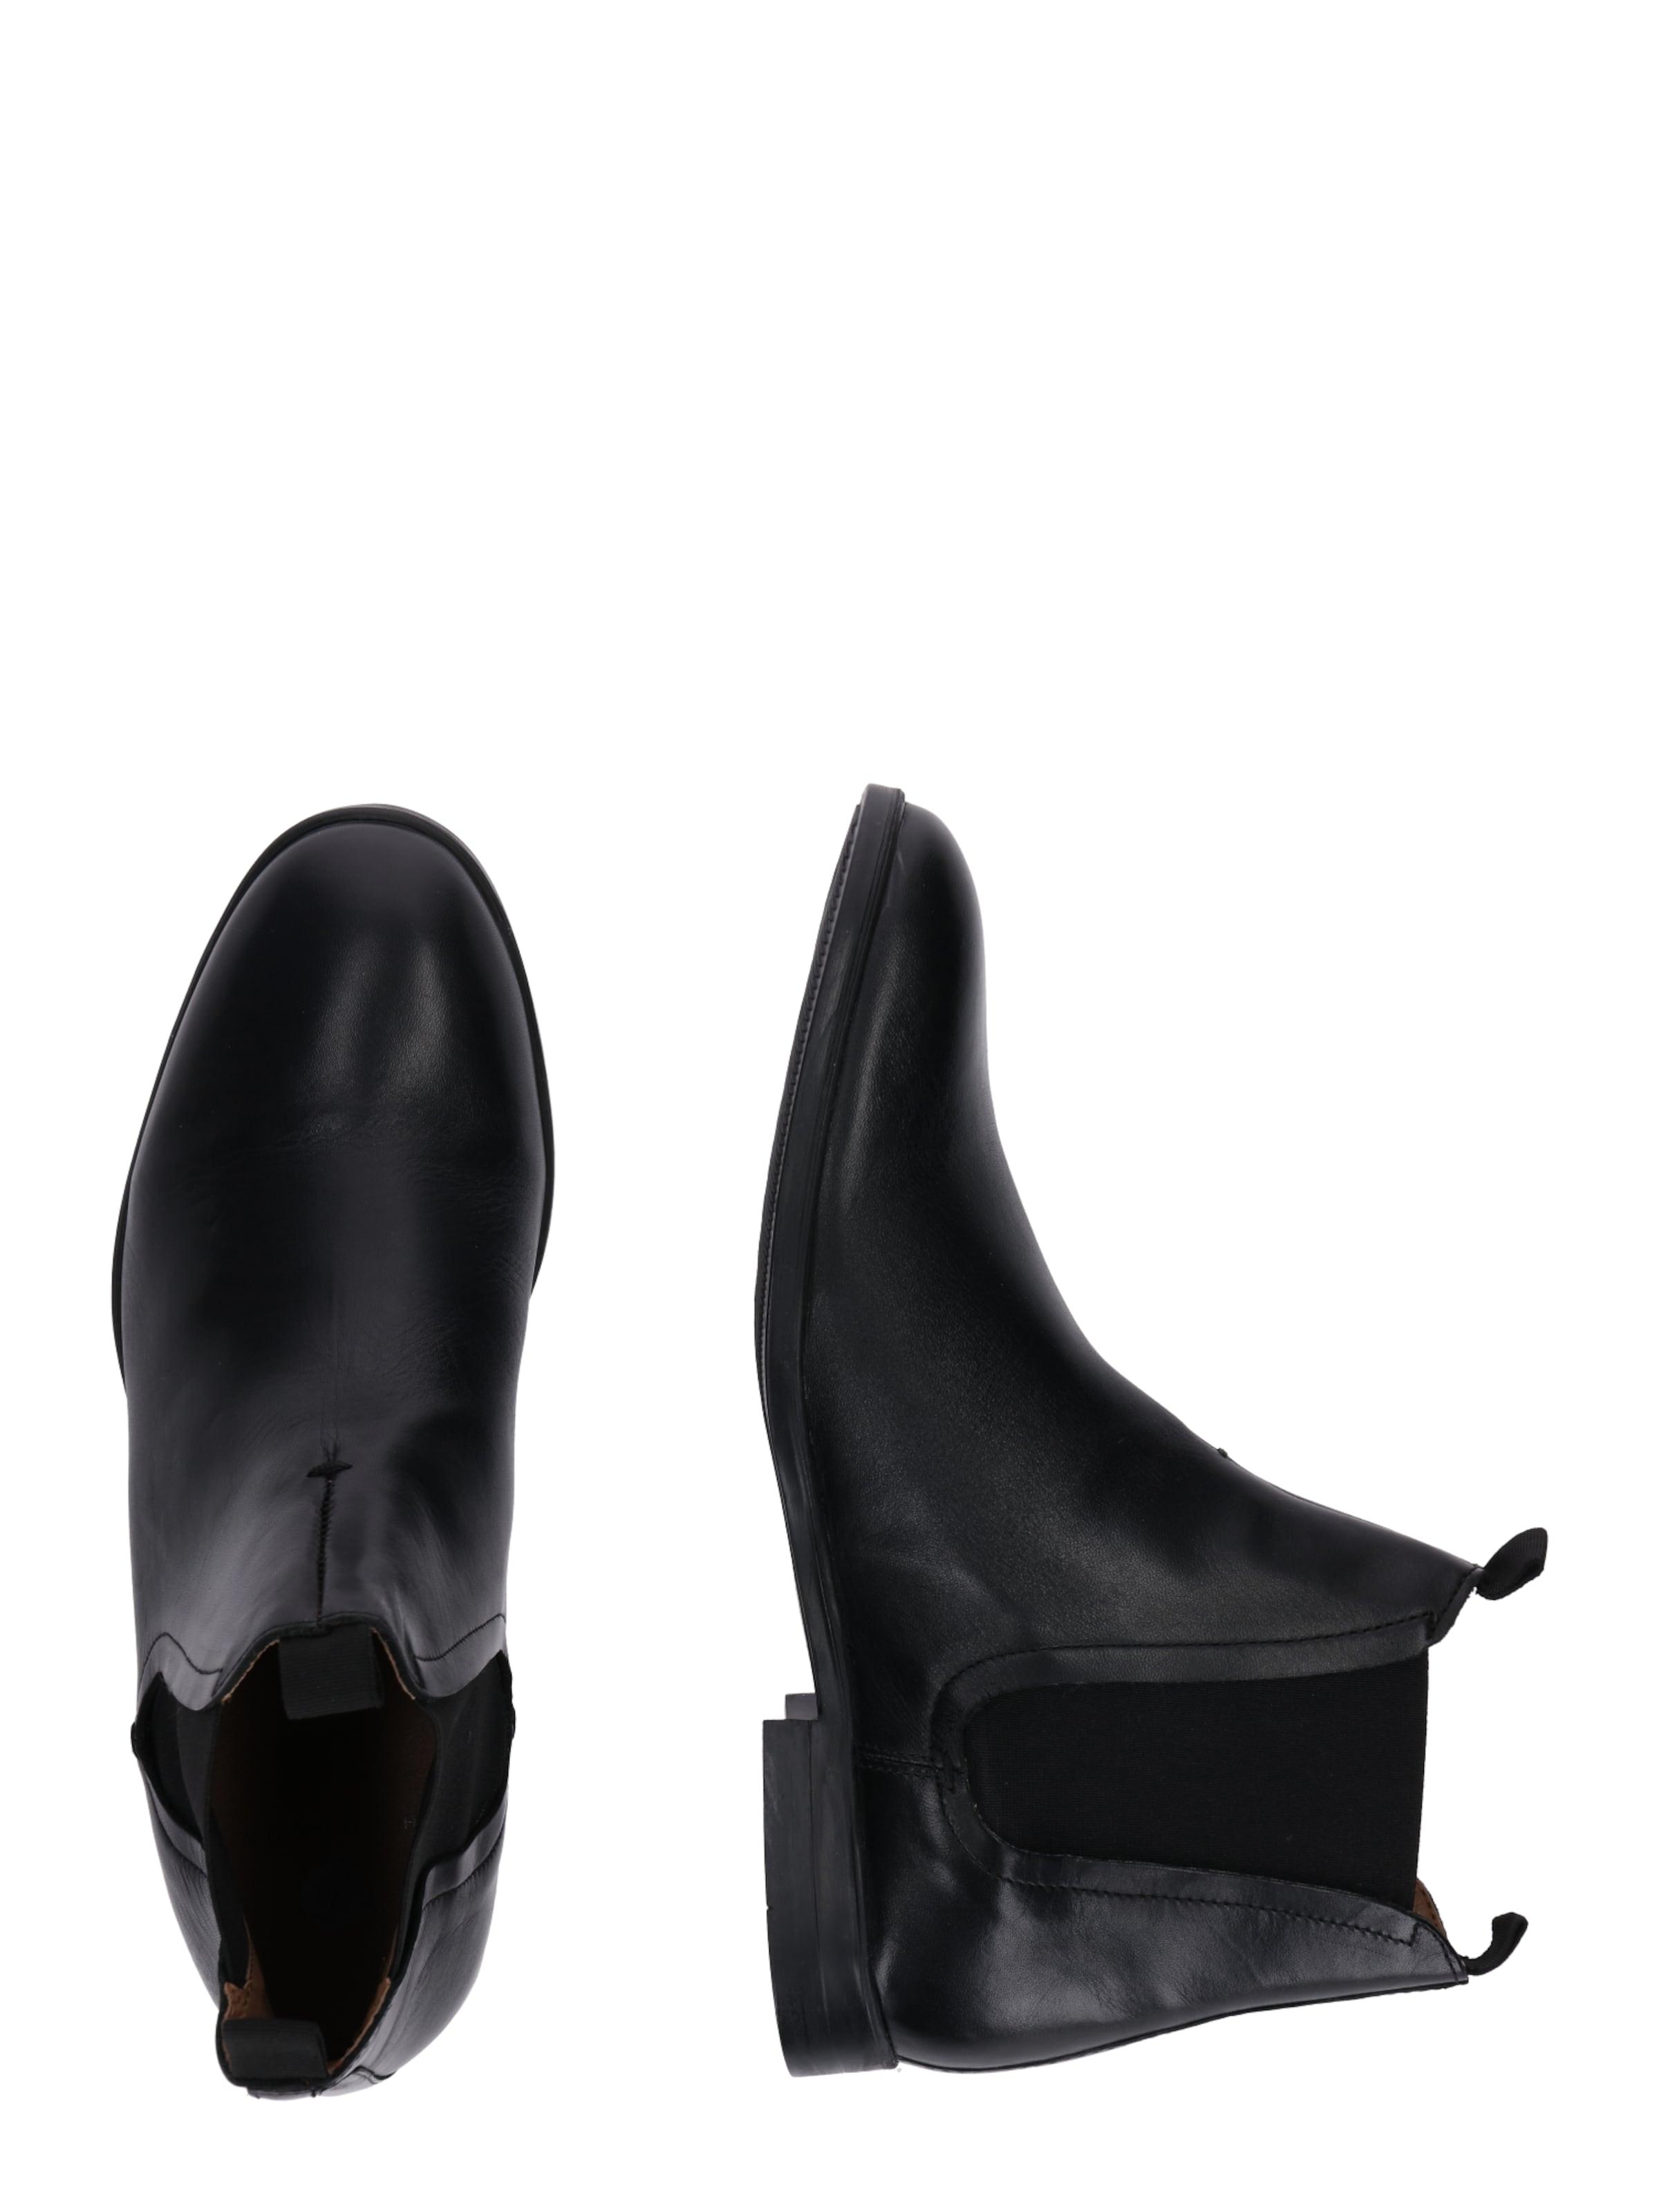 Hudson Chelsea Boots En Noir 'atherstone' London uTF3l5K1cJ